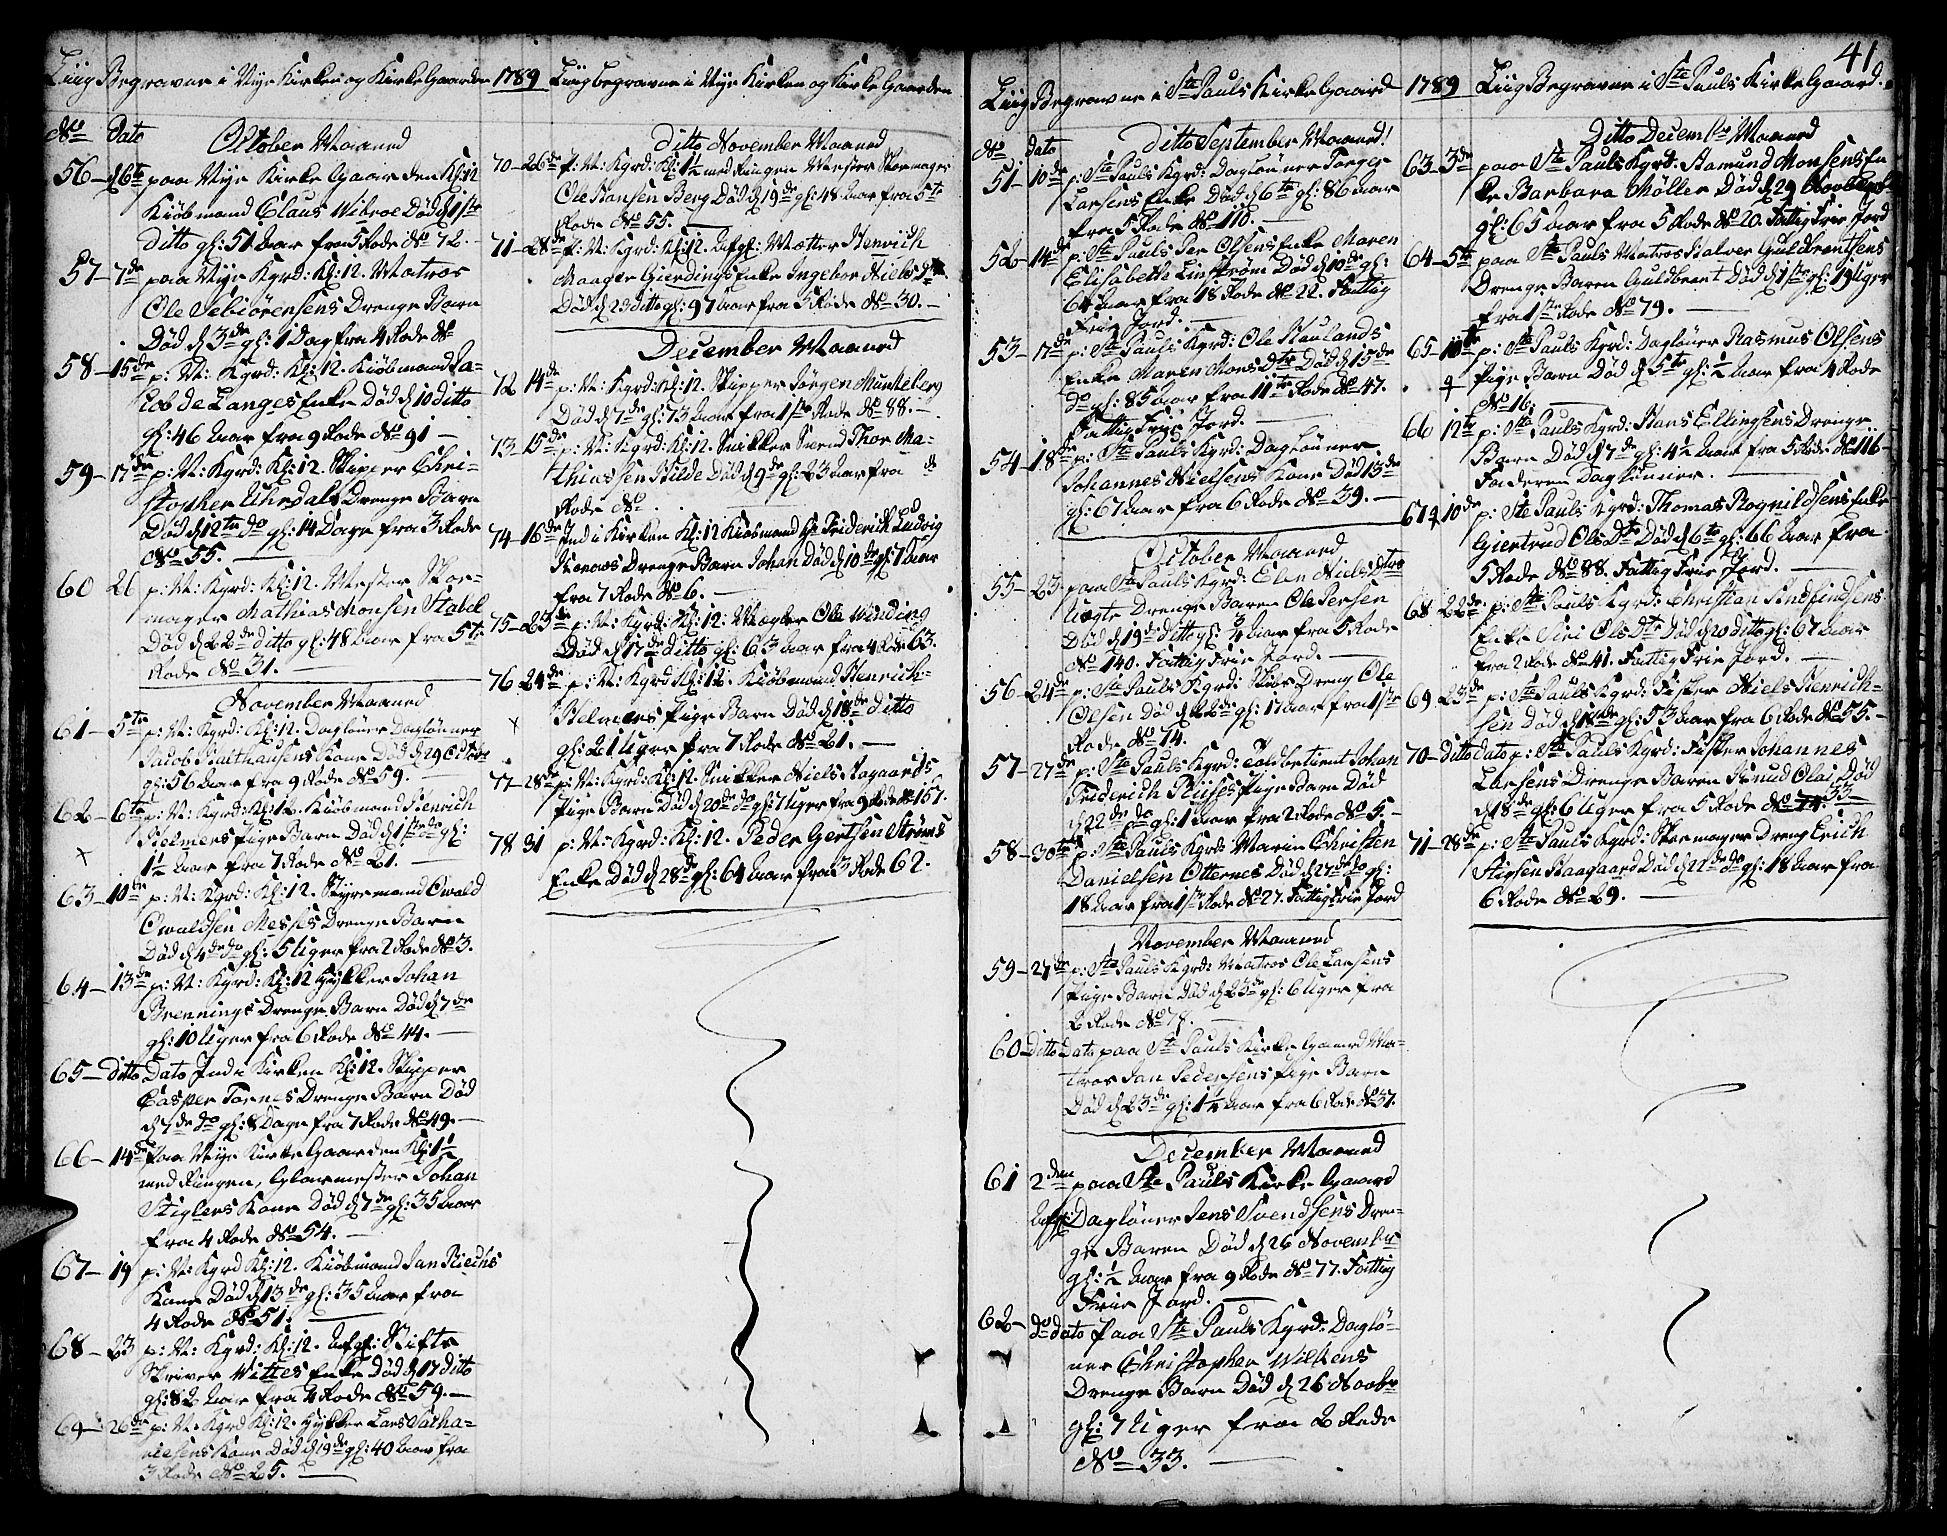 SAB, Nykirken Sokneprestembete, H/Hab: Klokkerbok nr. A 3, 1775-1820, s. 41